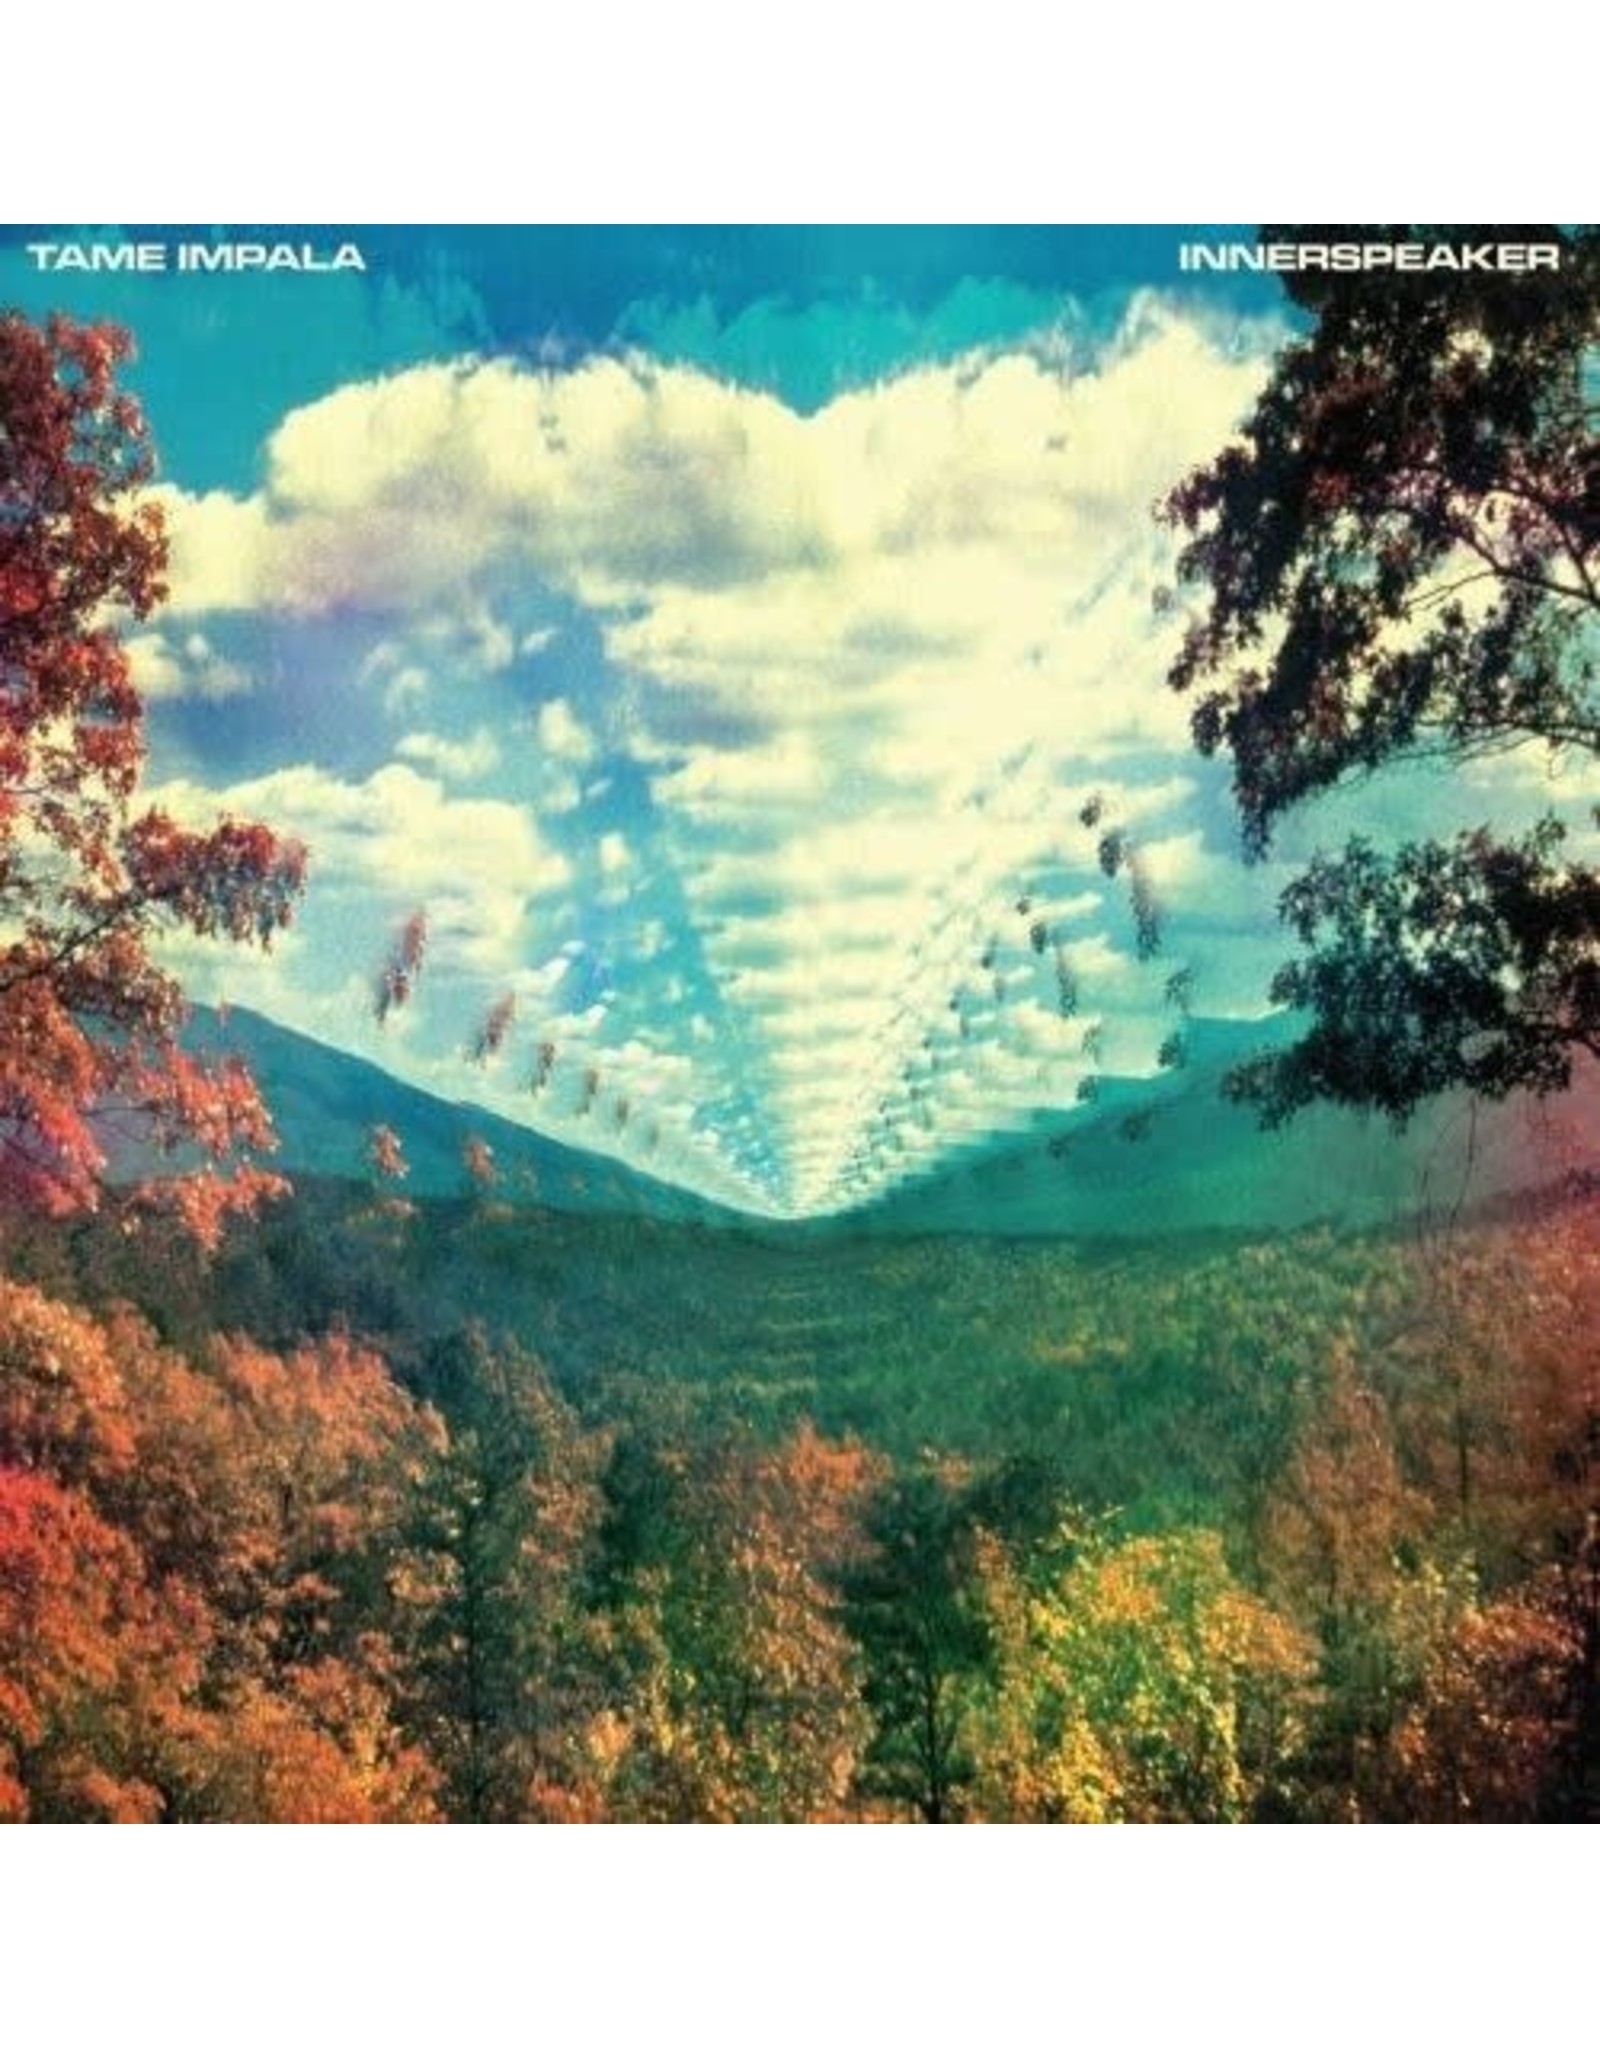 New Vinyl Tame Impala - Innerspeaker: 10 Year Anniversary Edition 4LP Box